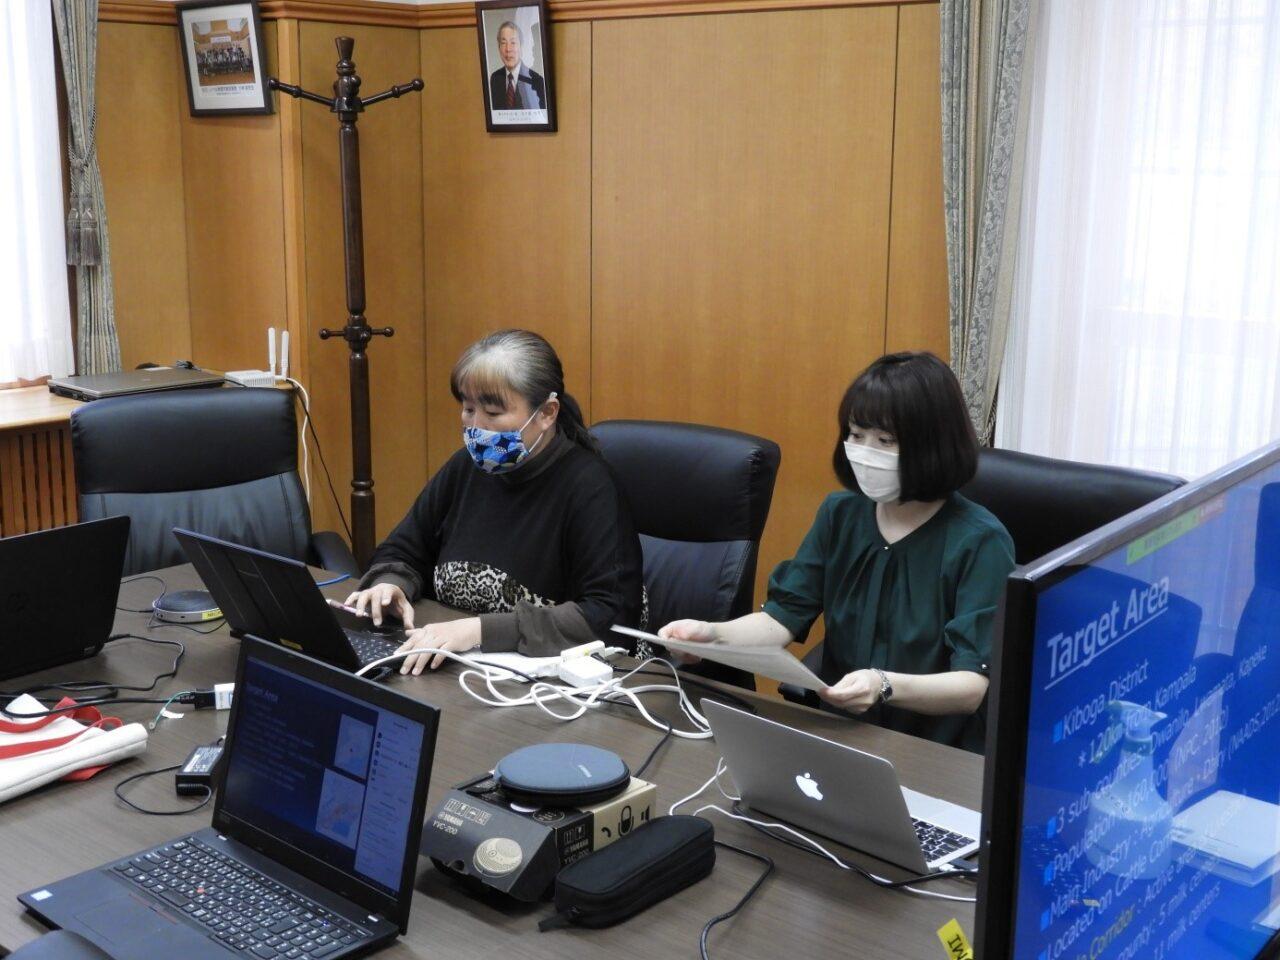 発表時の様子(左:大木奈美先生、右:白藤助教)/Presentation by Dr. Nabi Oki (Right: Dr. Rika Umemiya-Shirafuji)